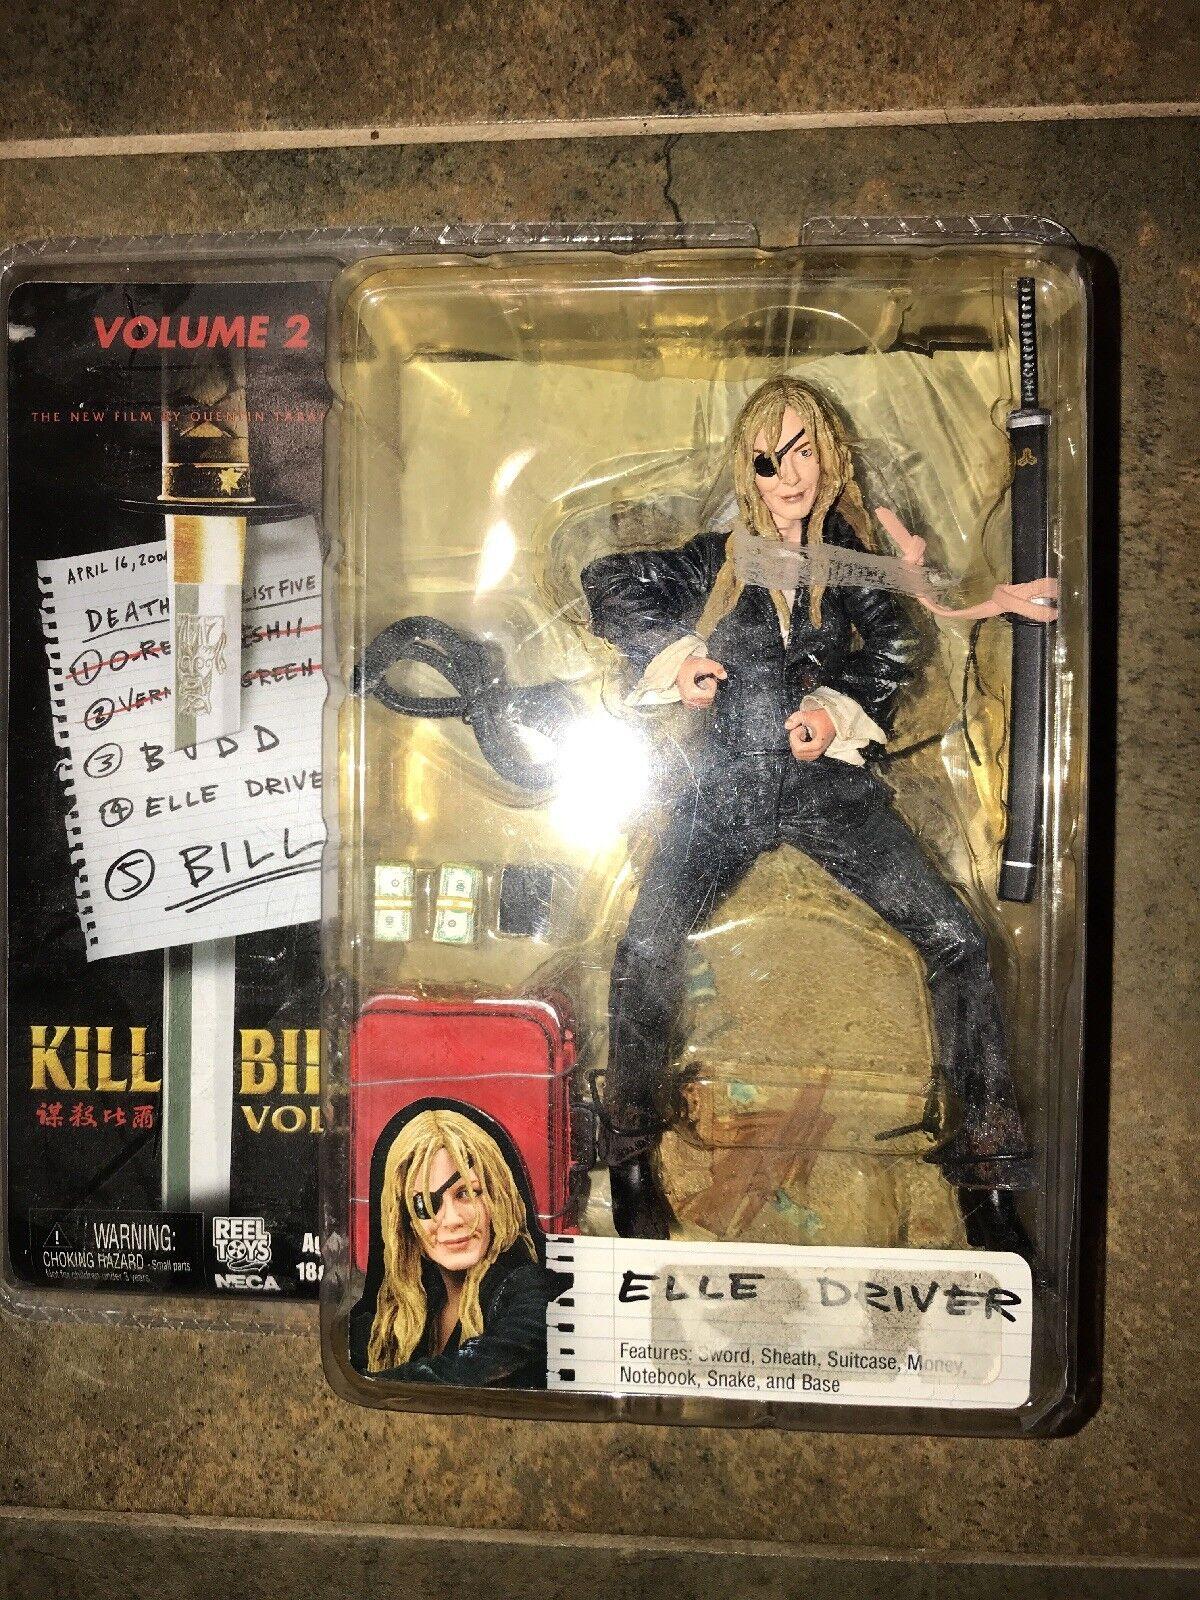 Kill Kill Kill bill vol. 2   elle driver neca actionfigur daryl hannah   new in box 127f4c